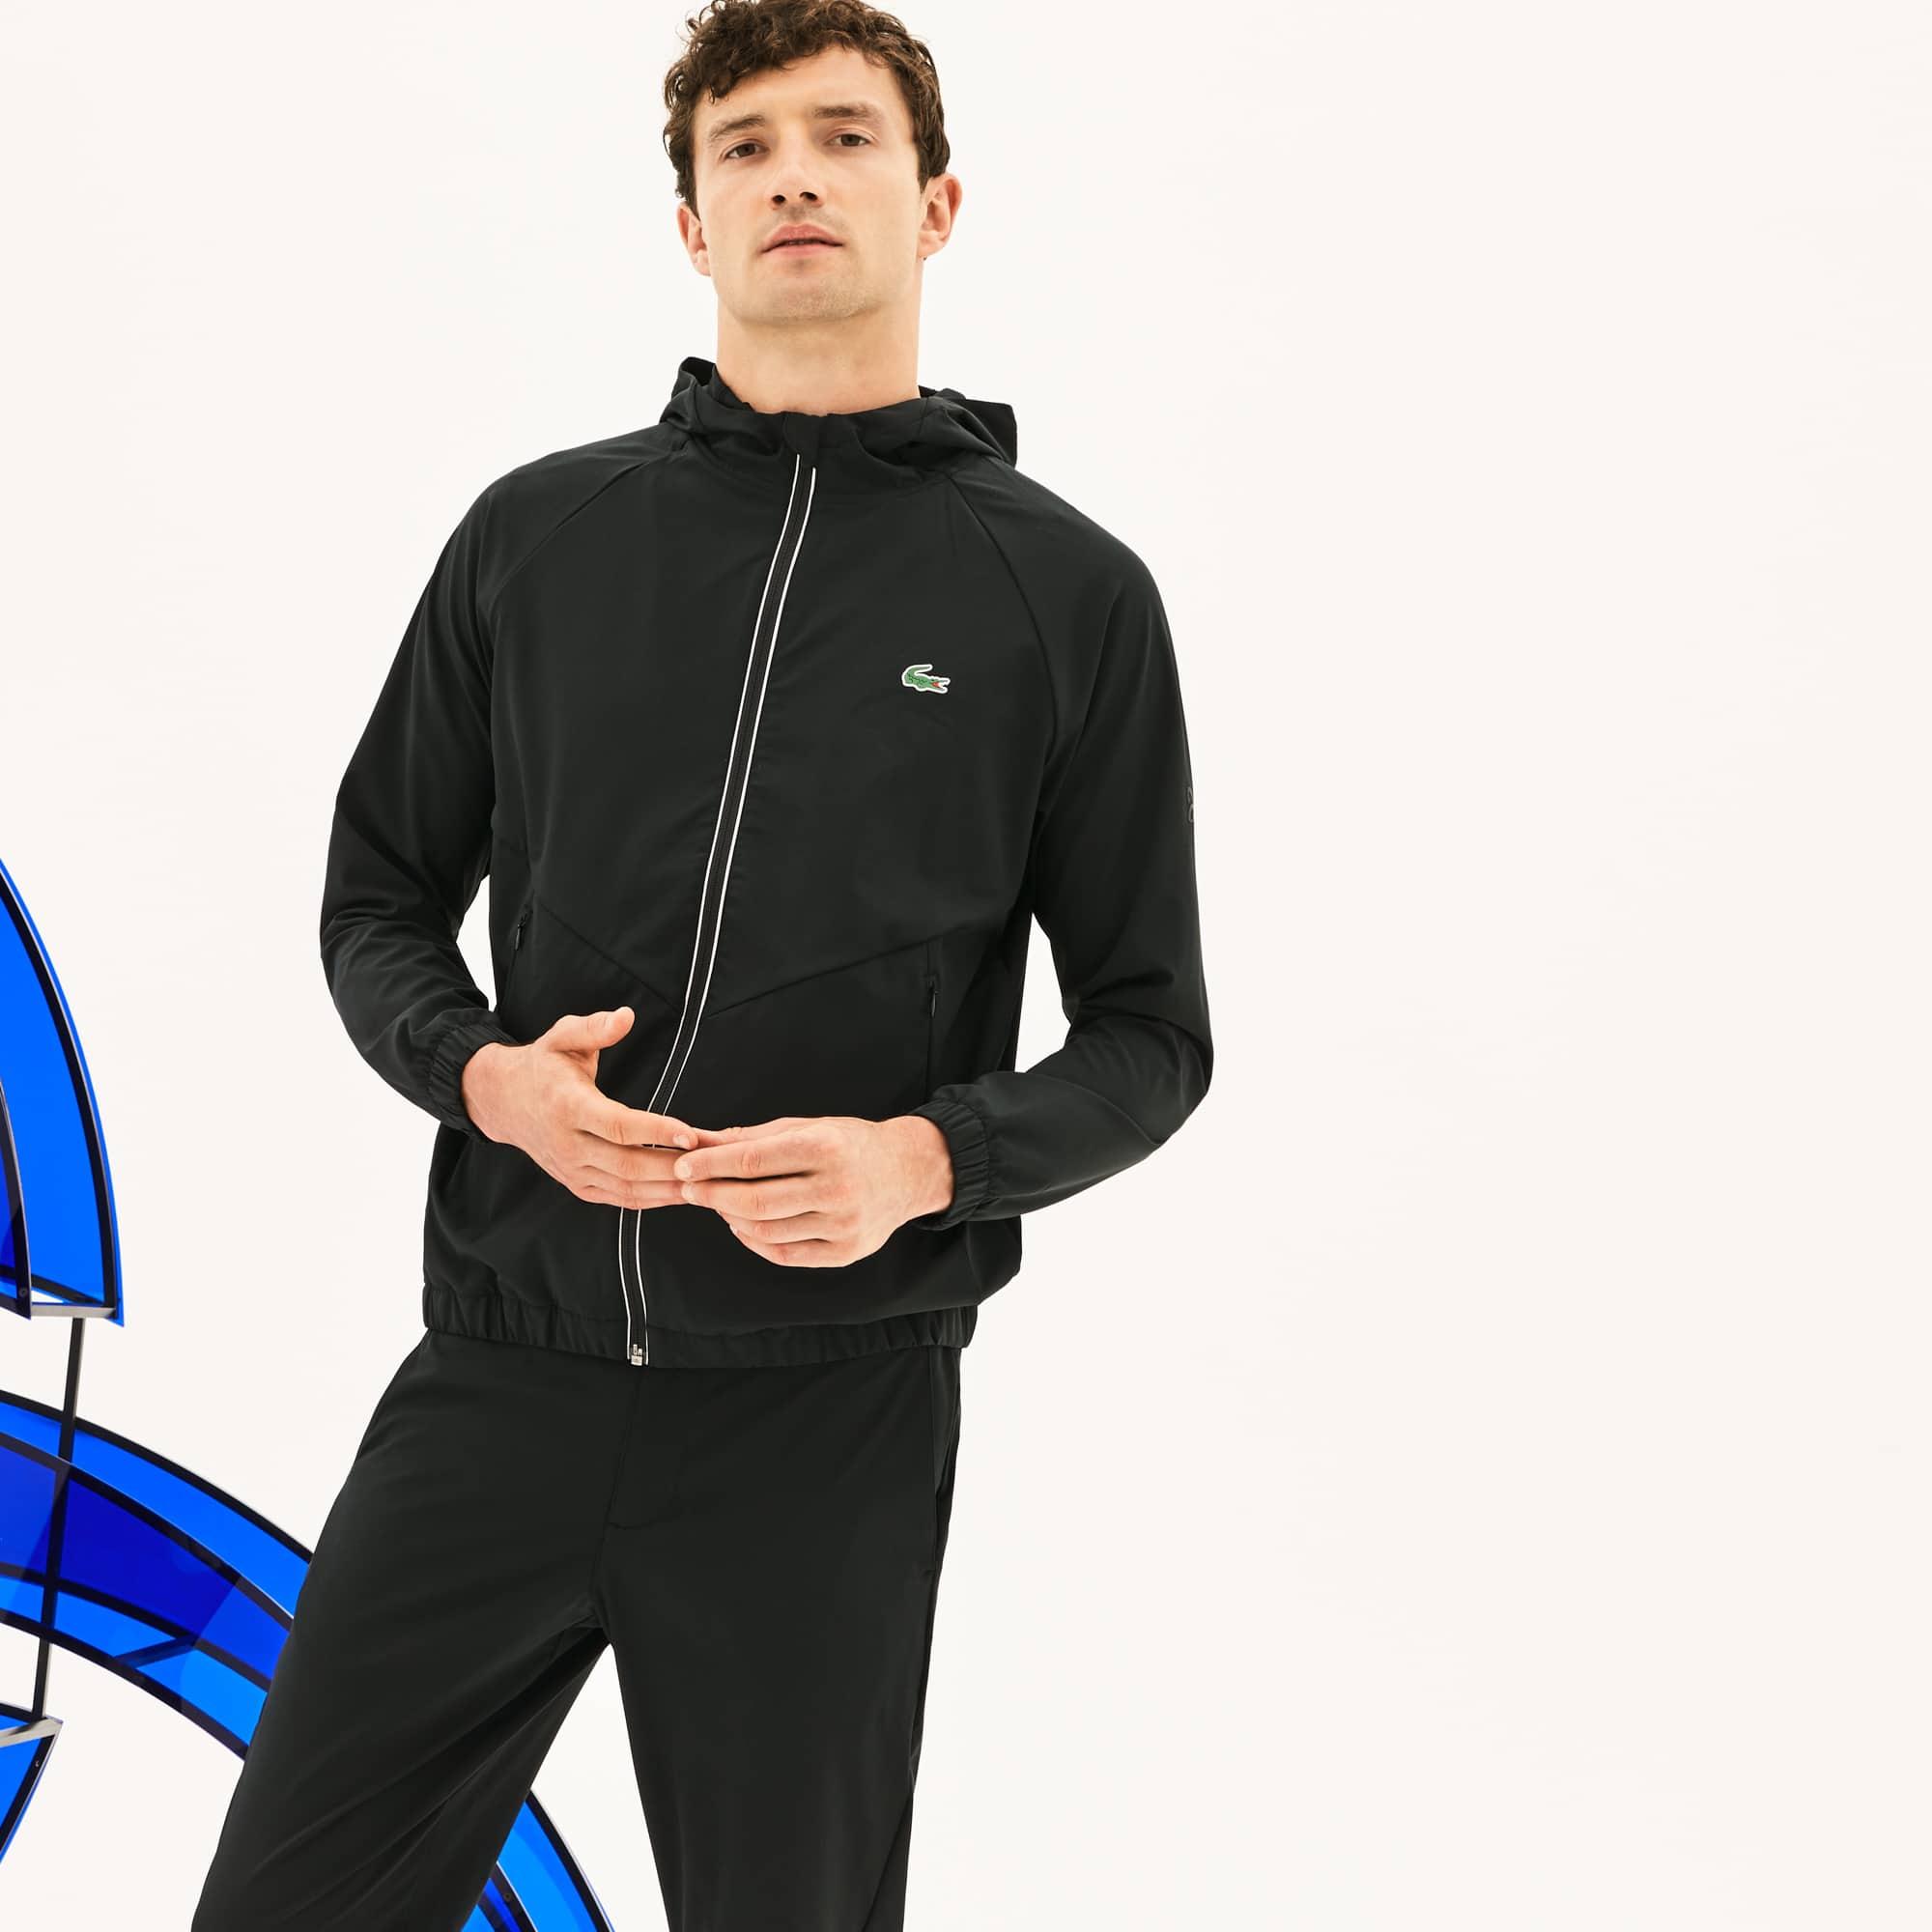 Men's SPORT Hooded Technical Midlayer Jacket -  x Novak Djokovic Off Court Premium Edition